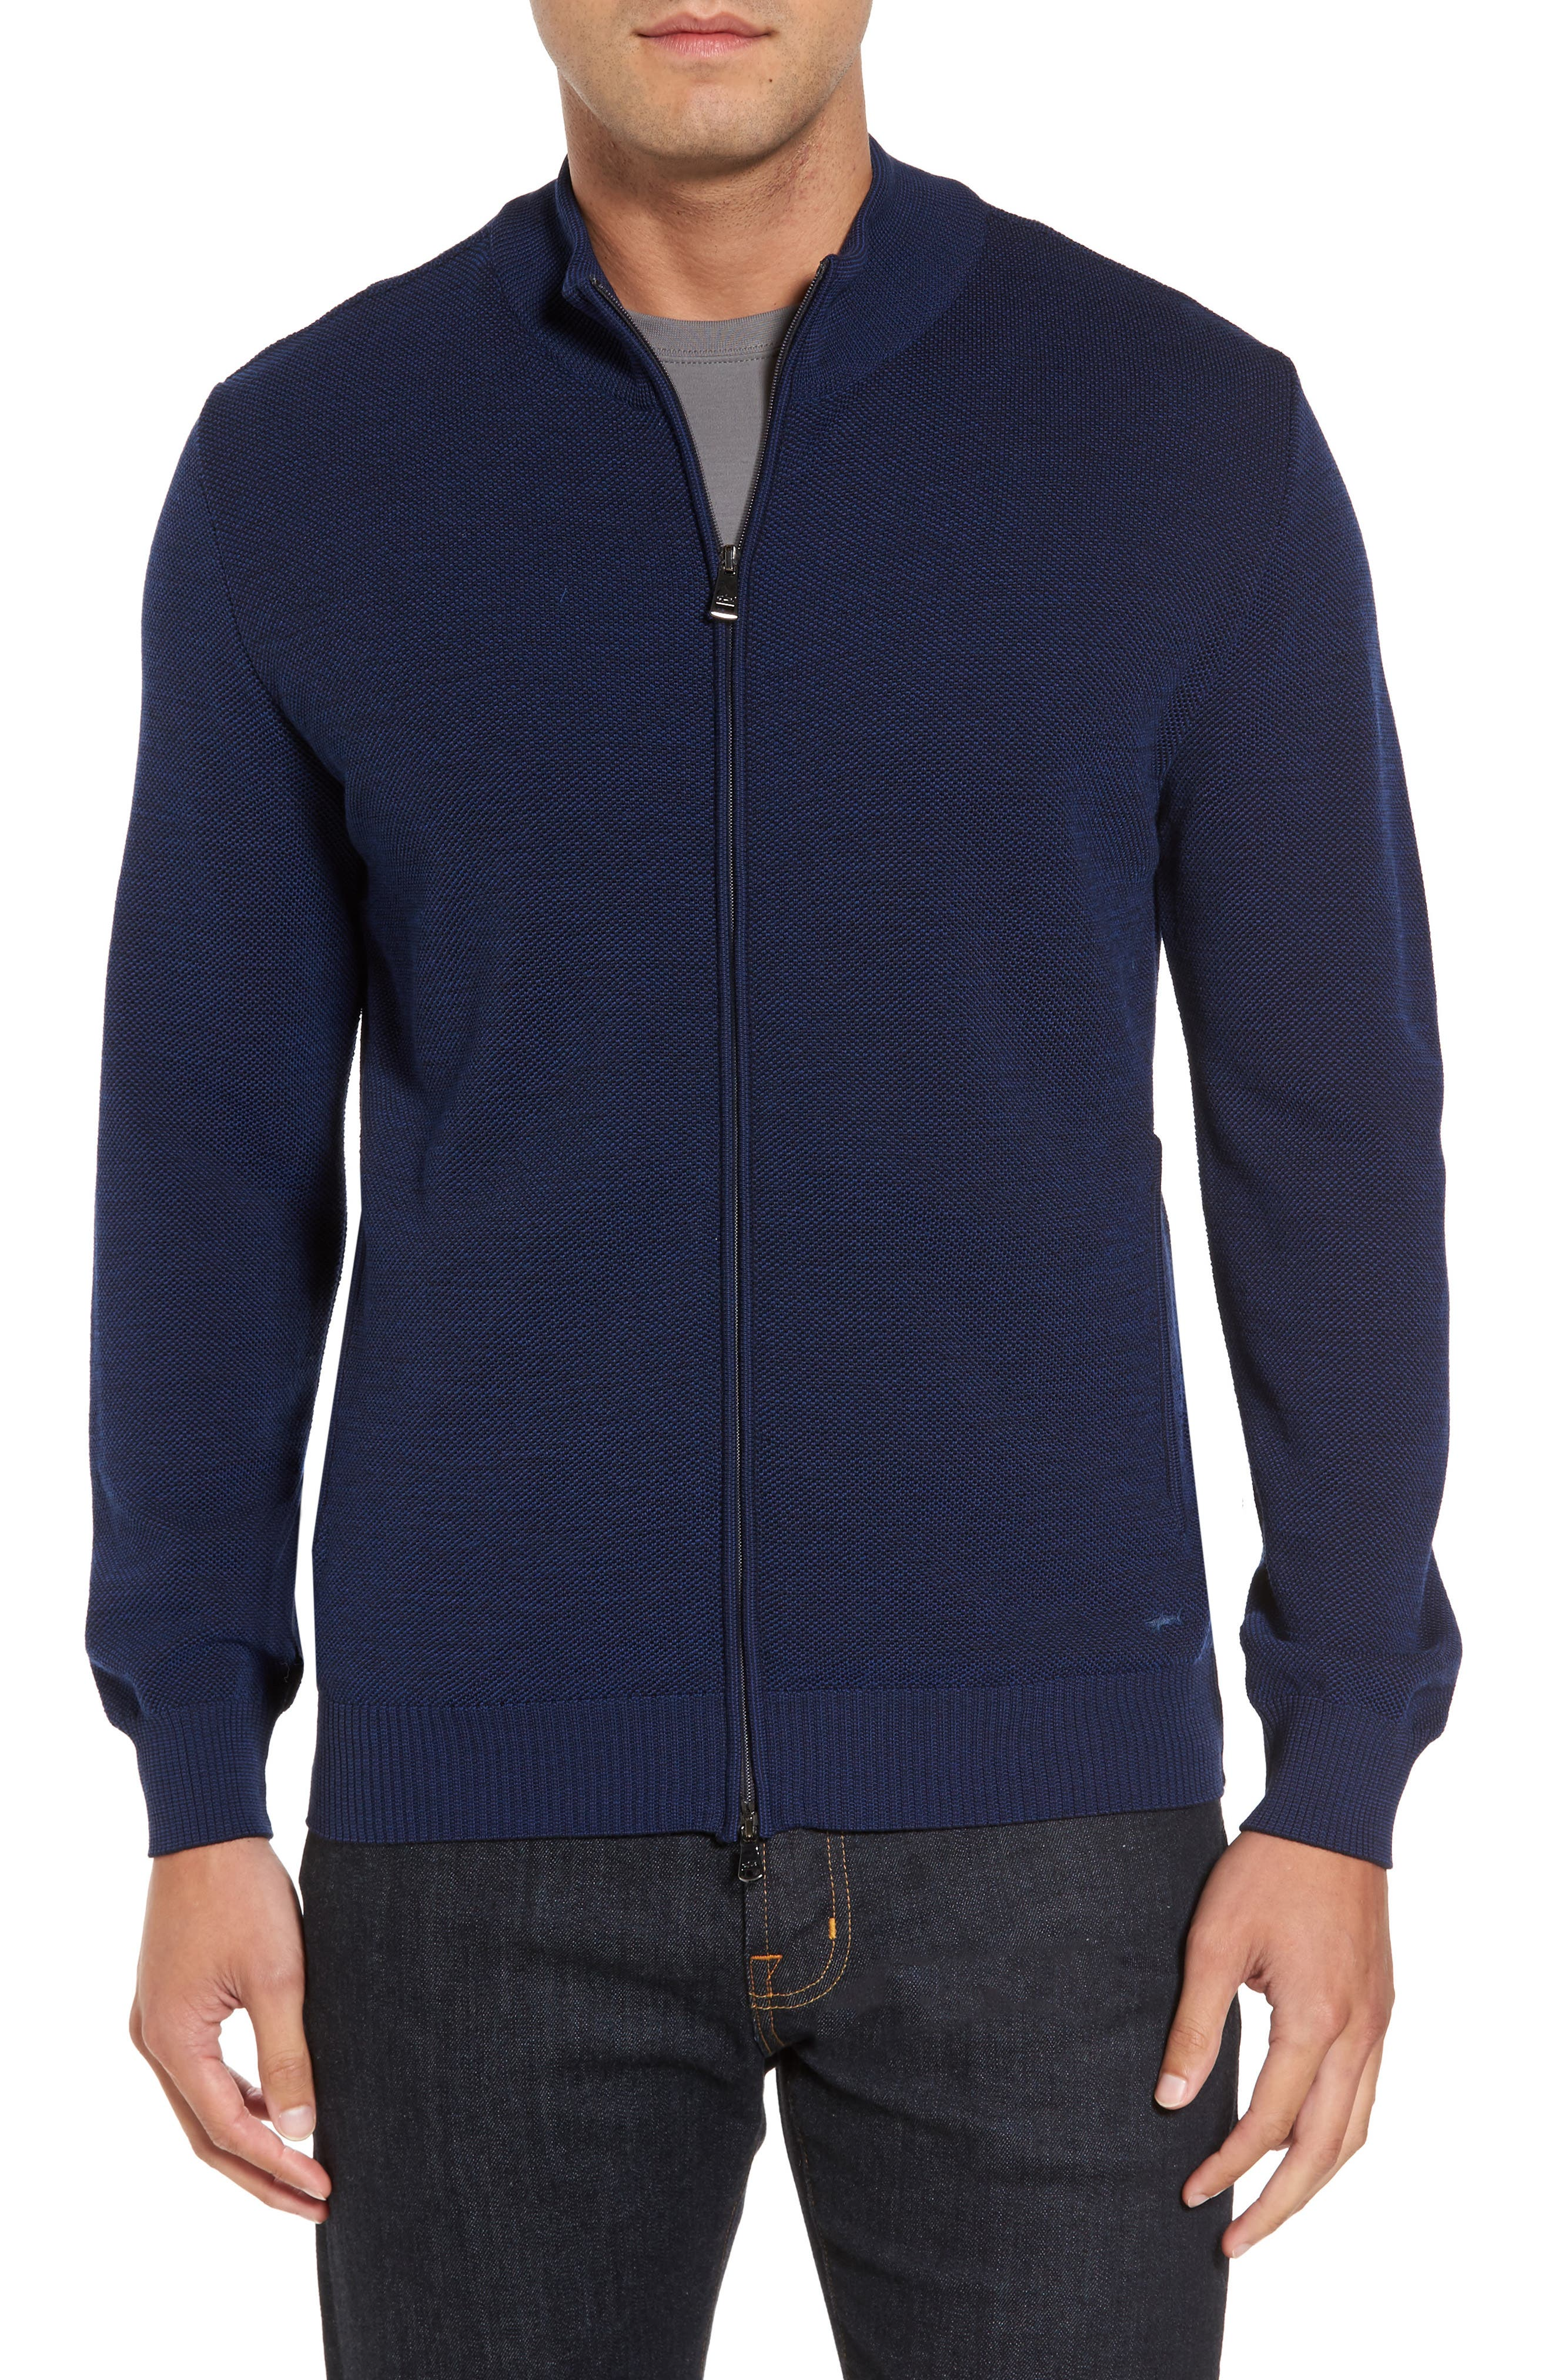 Paul&Shark Piqué Zip Wool Sweater,                         Main,                         color, Blue